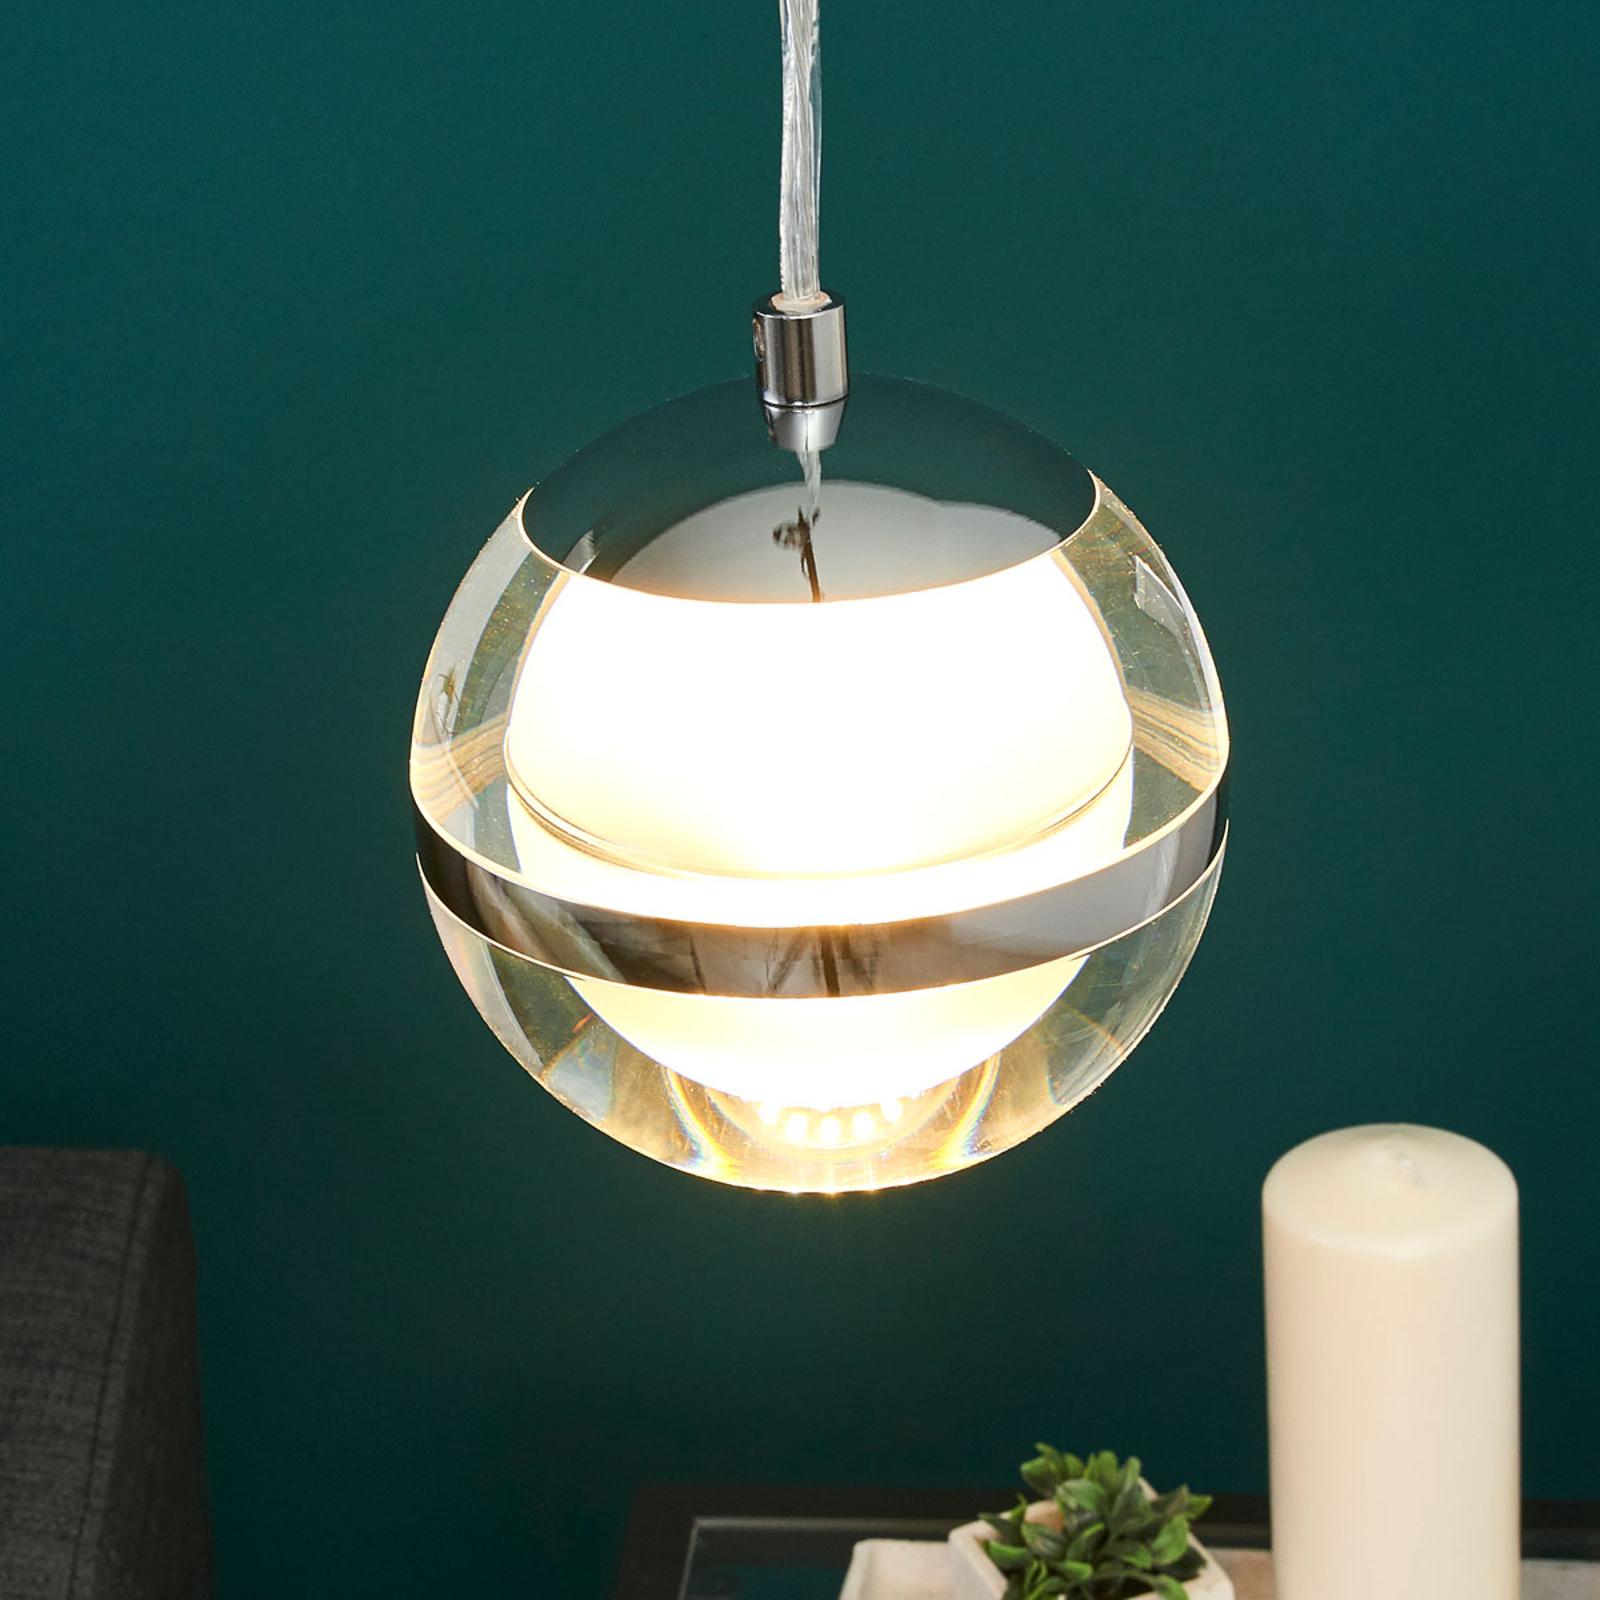 Fulton - oryginalna lampa wisząca LED